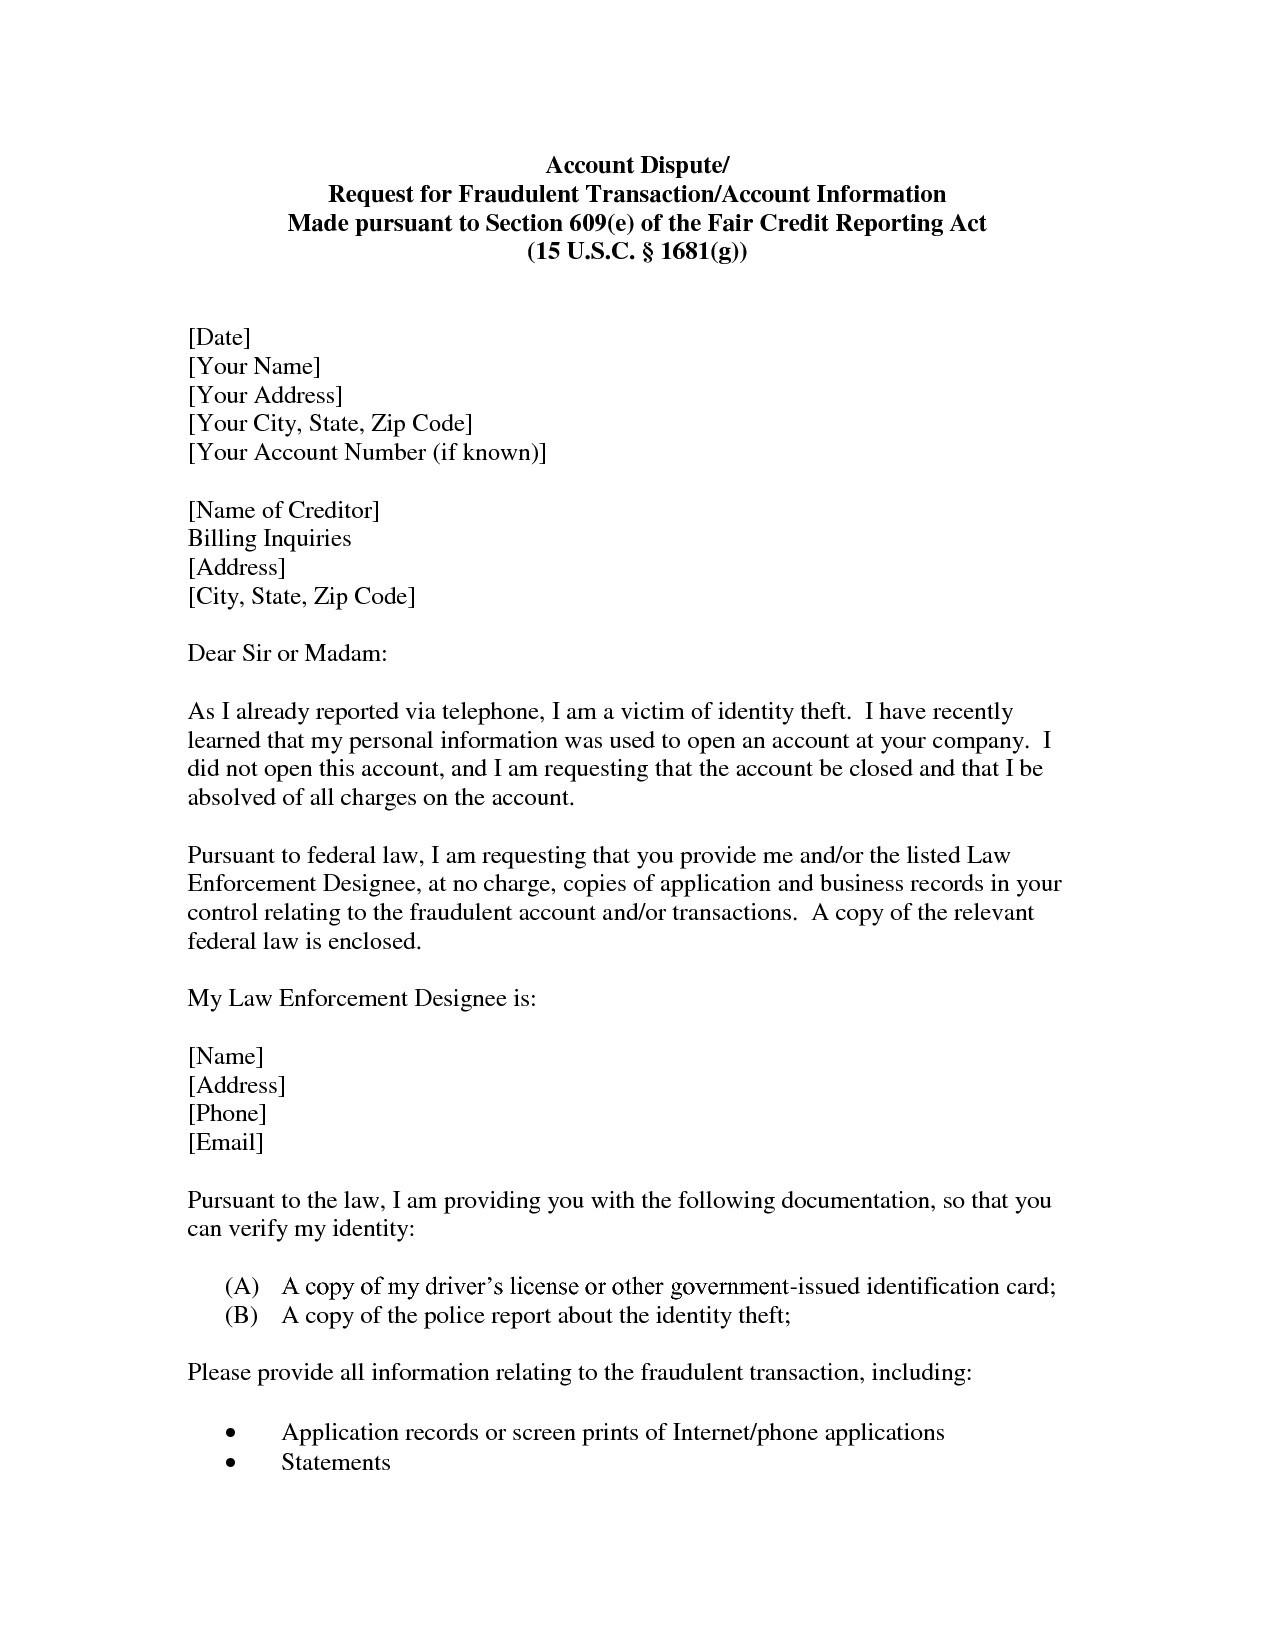 Tax Credit Dispute Letter Sample Valid  Credit Letter Template Within Dispute Letter To Creditor Template